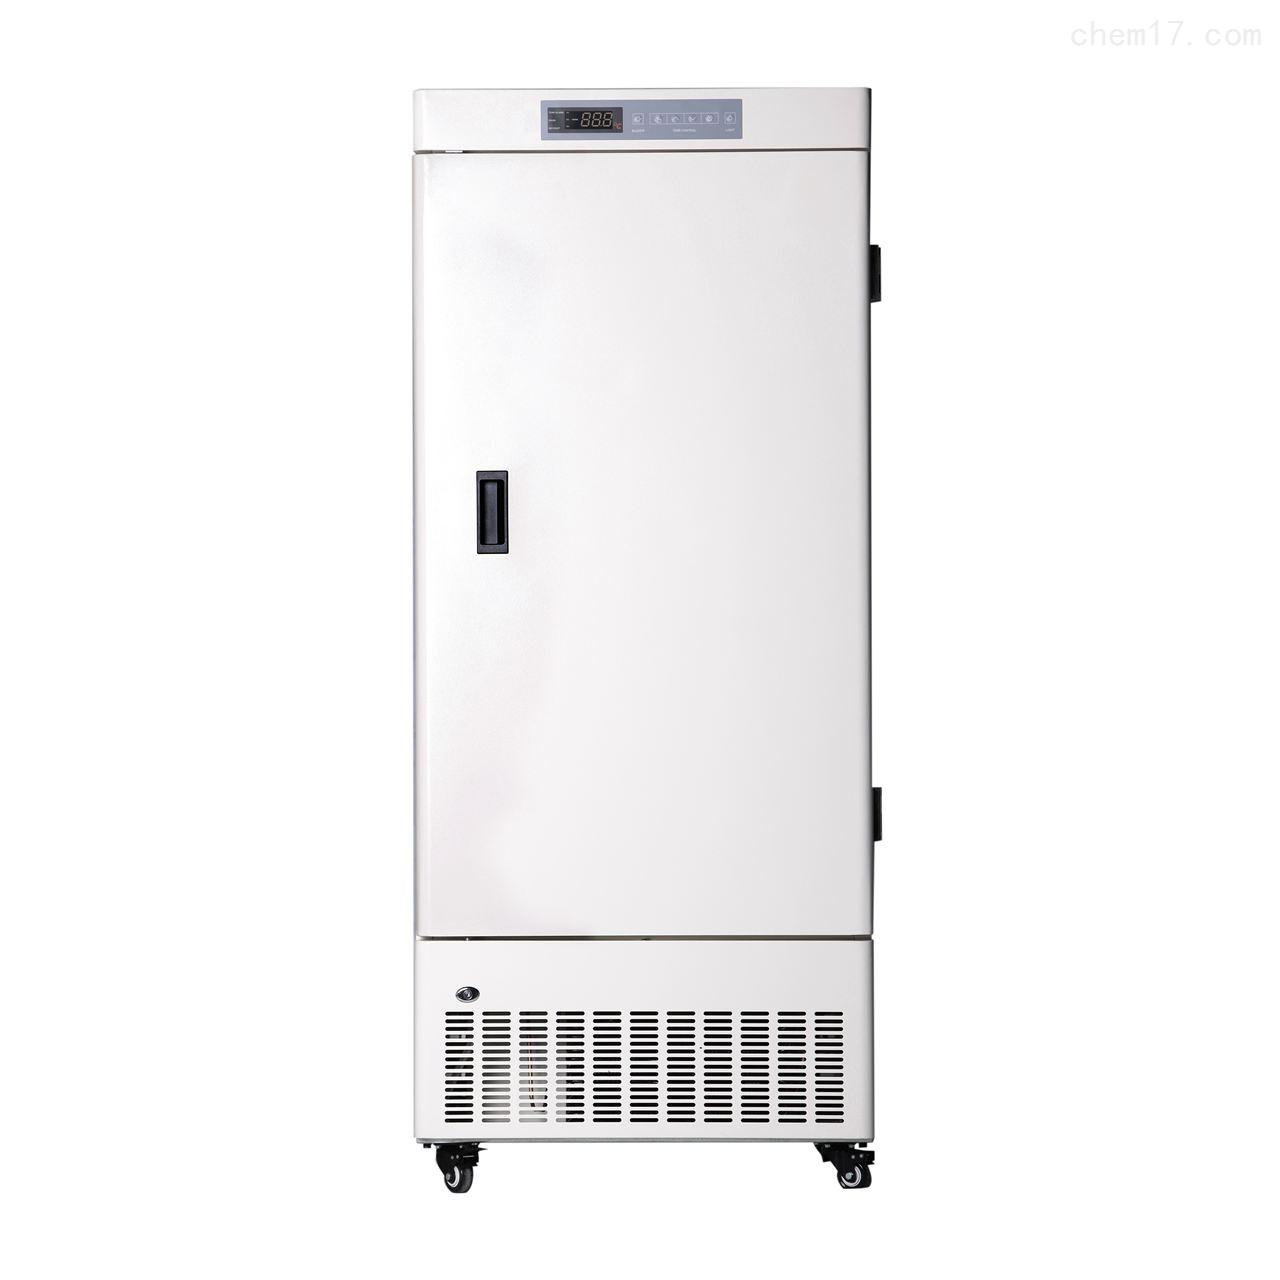 中科都菱-25/-40℃低温保存箱  MDF-25V268E